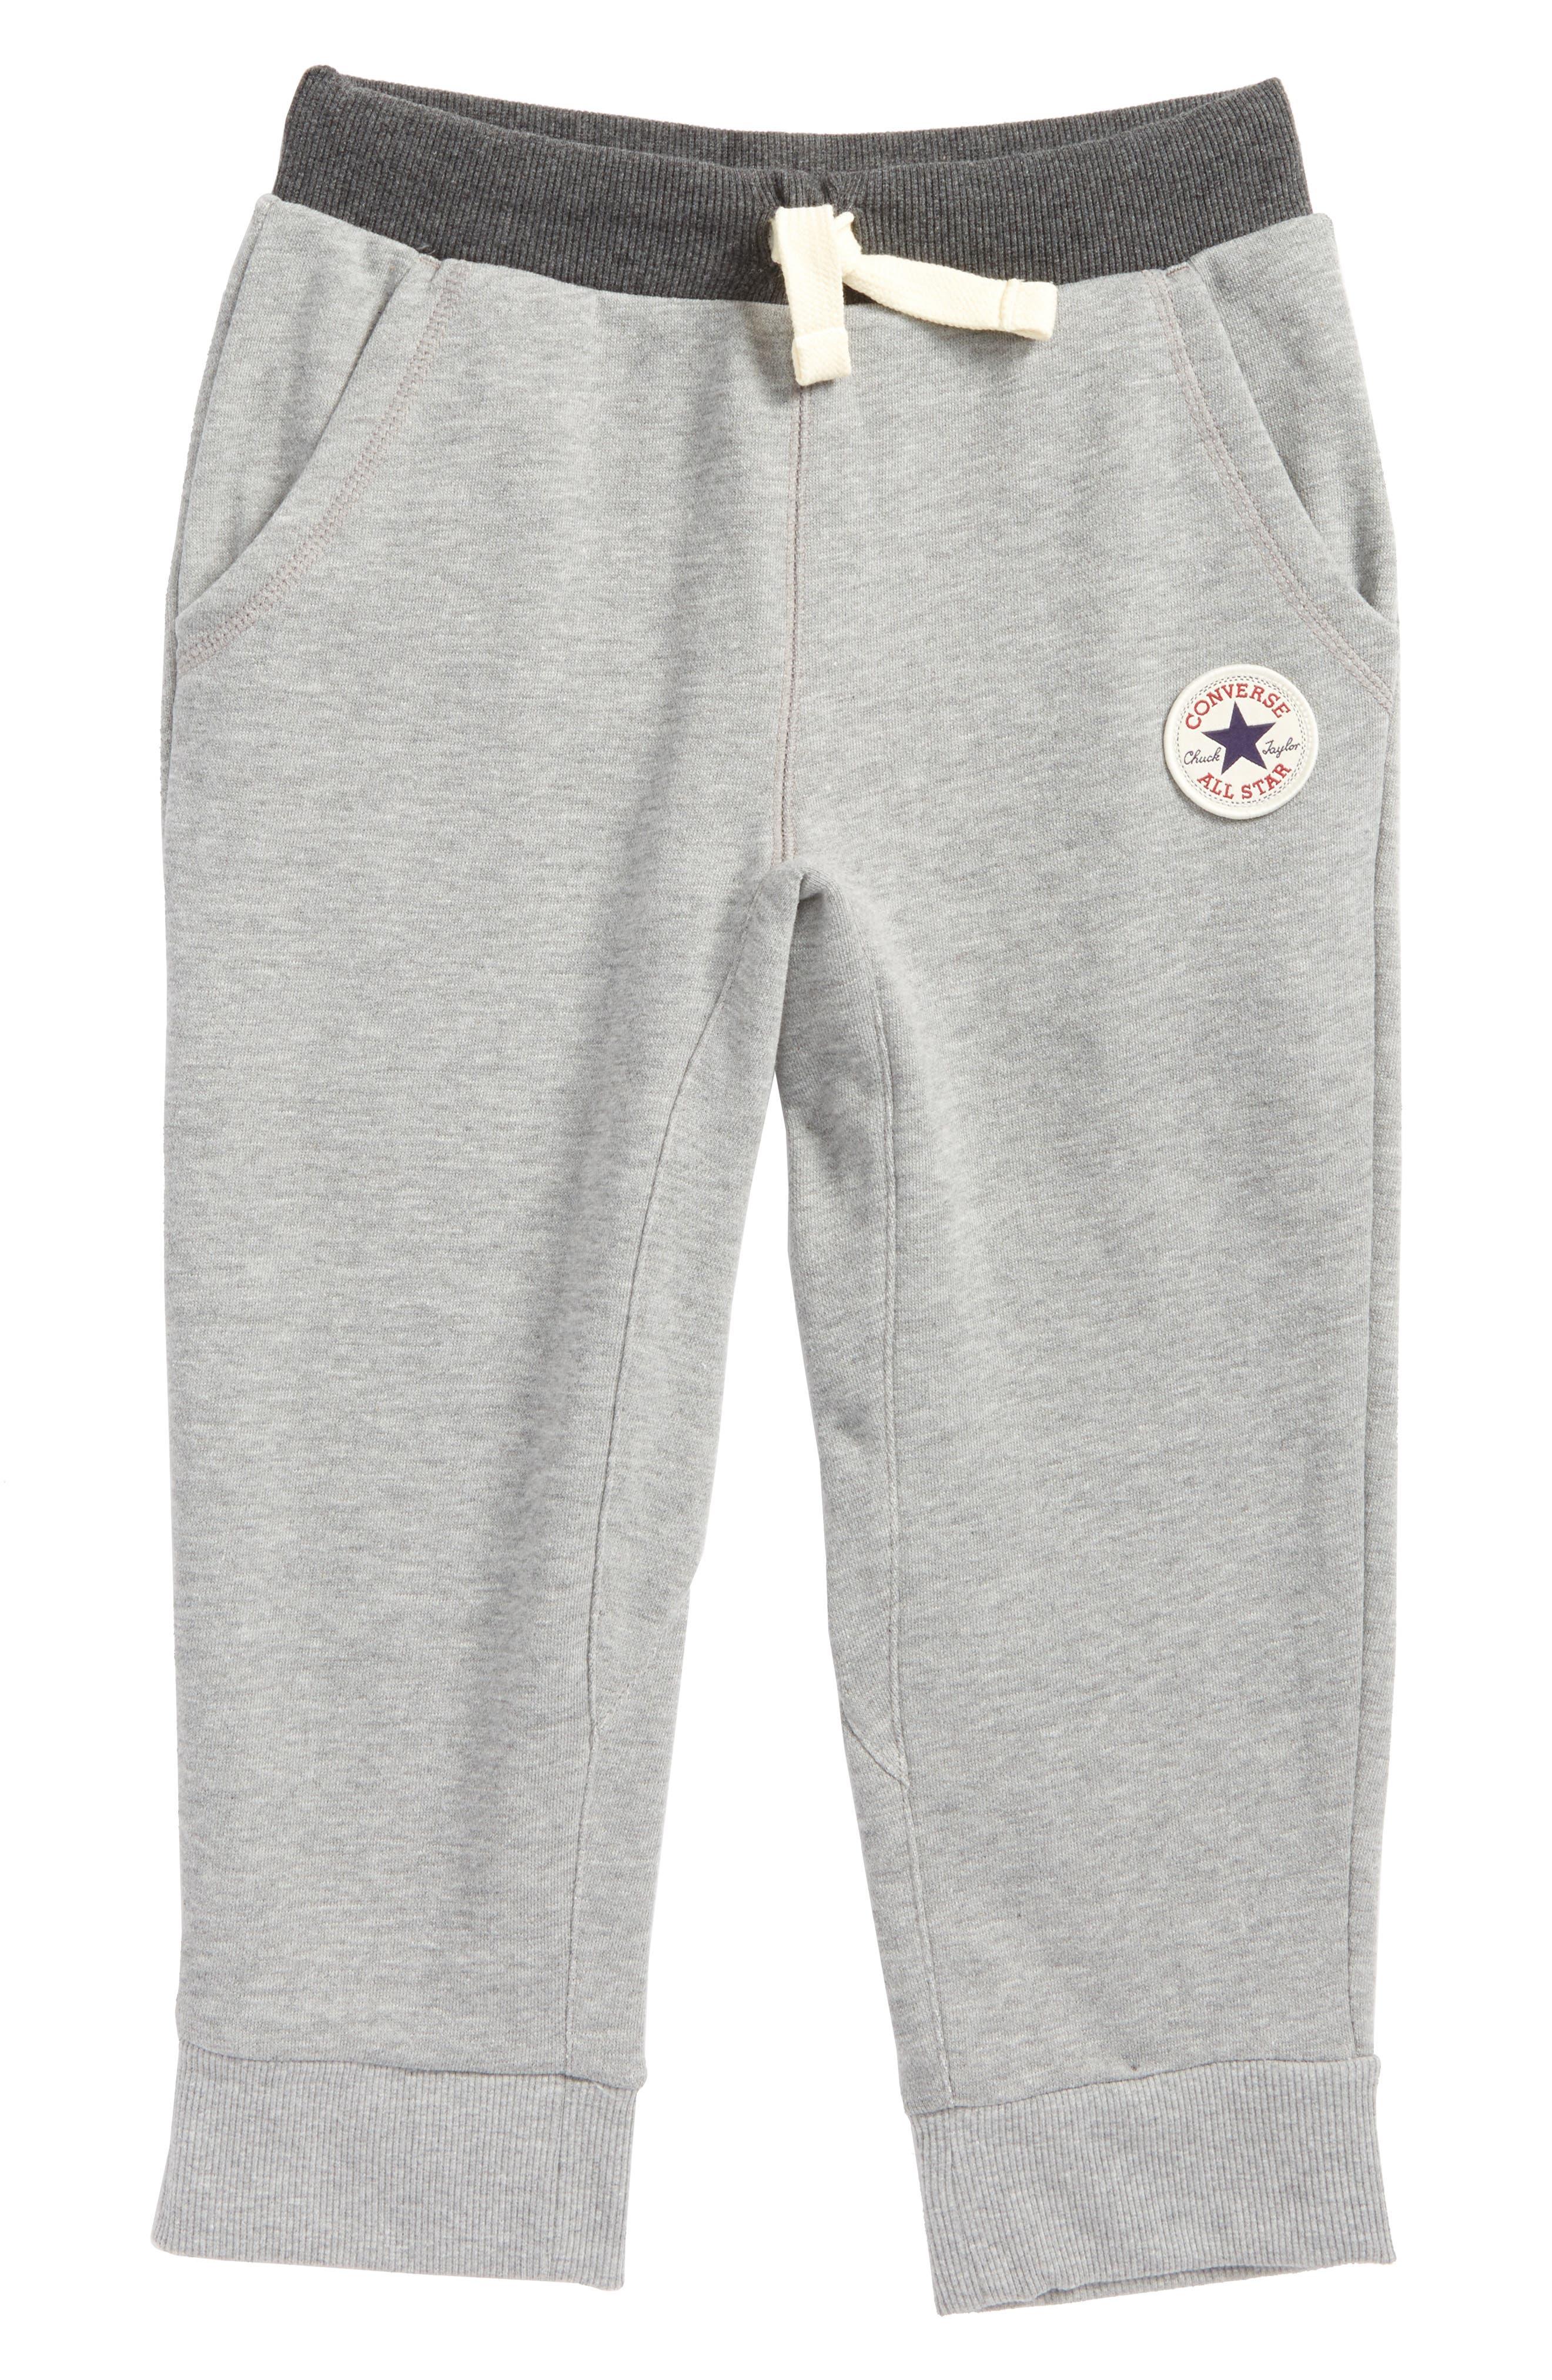 Crop Sweatpants,                         Main,                         color, Dark Grey Heather